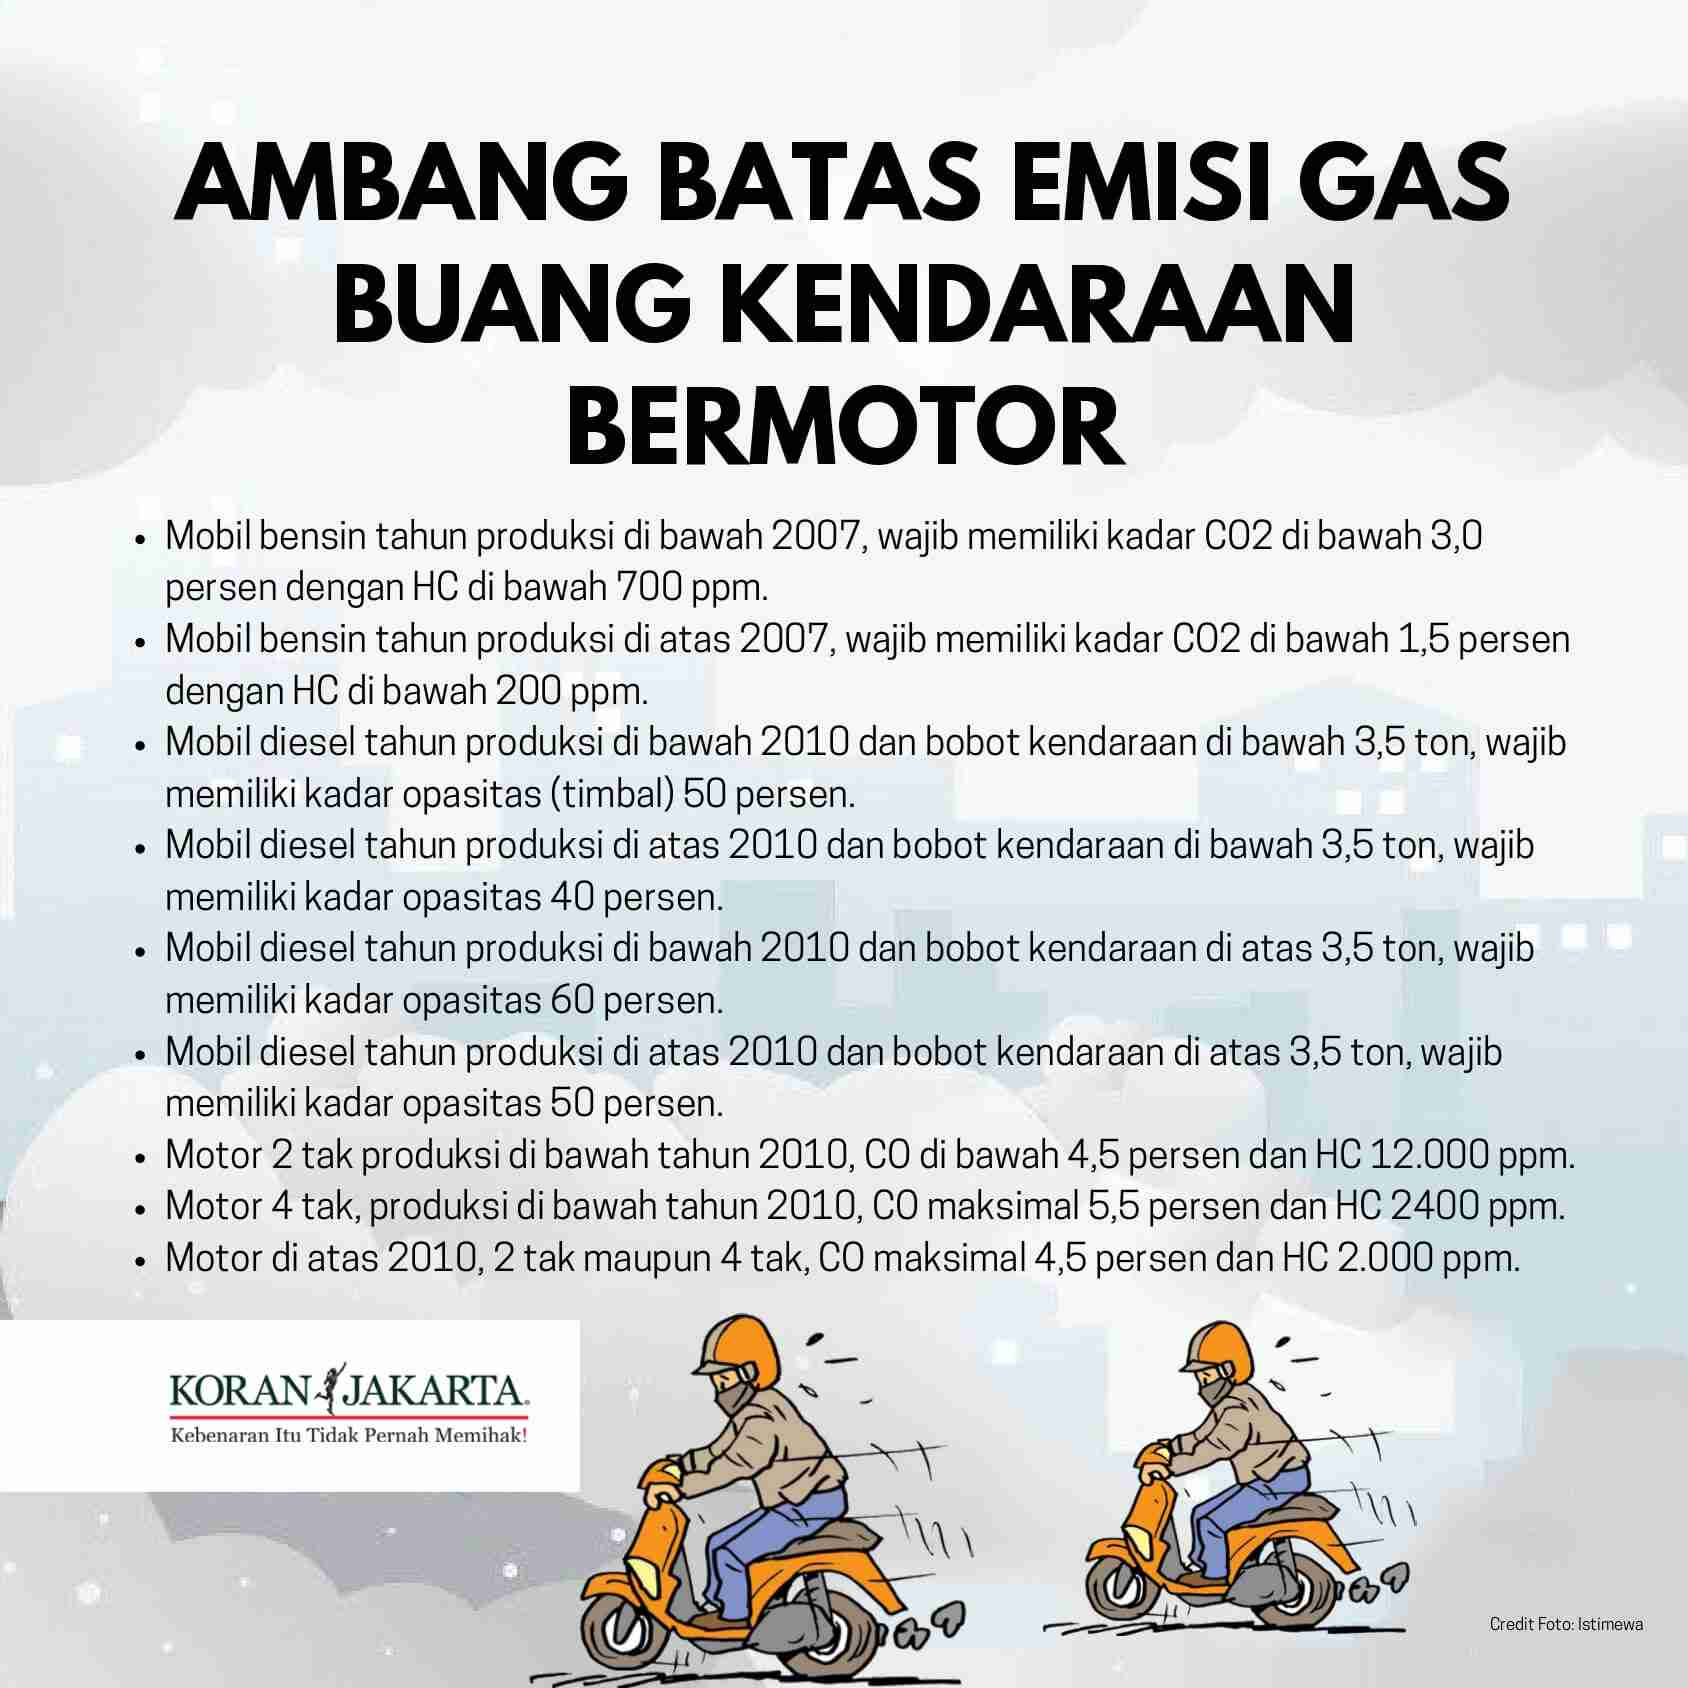 Dampak Polutan Kendaraan Bermotor 6